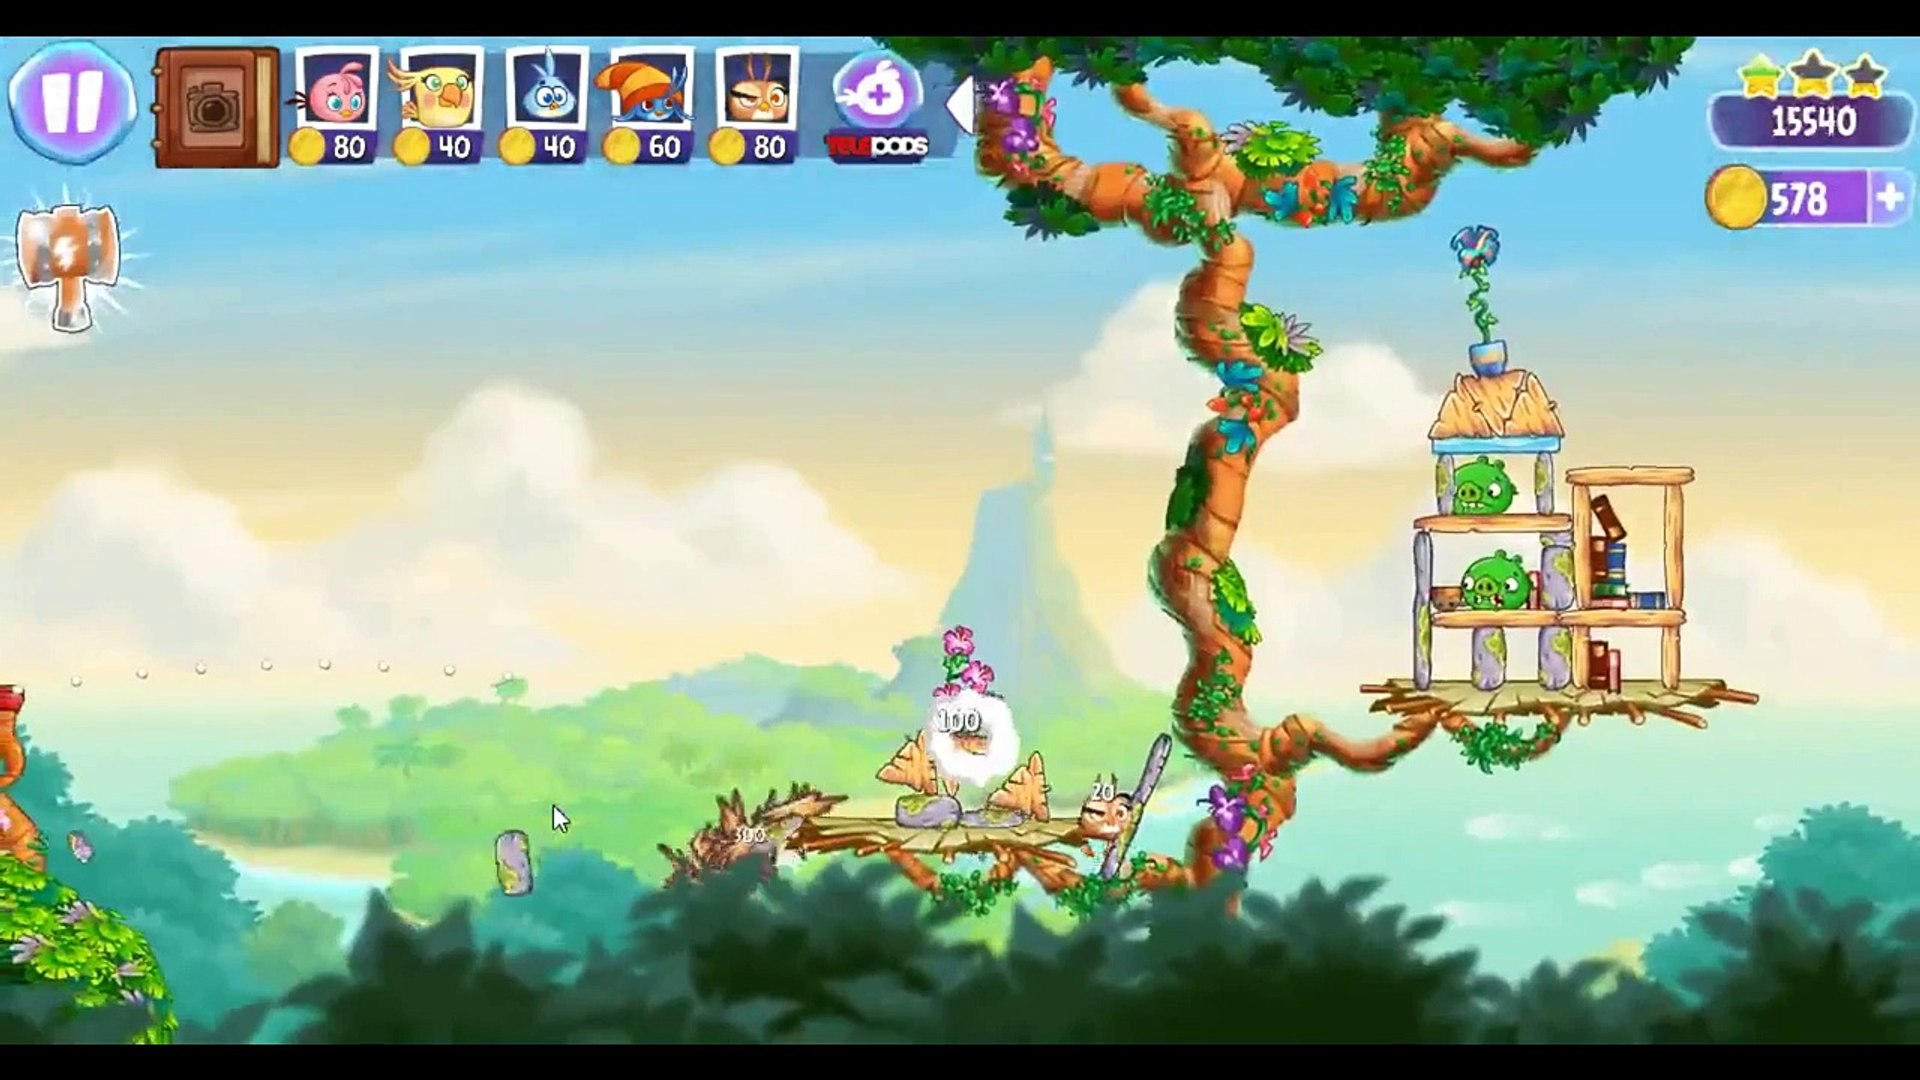 Angry Birds Stella Level 48 ★★★ Walkthrough Episode 1